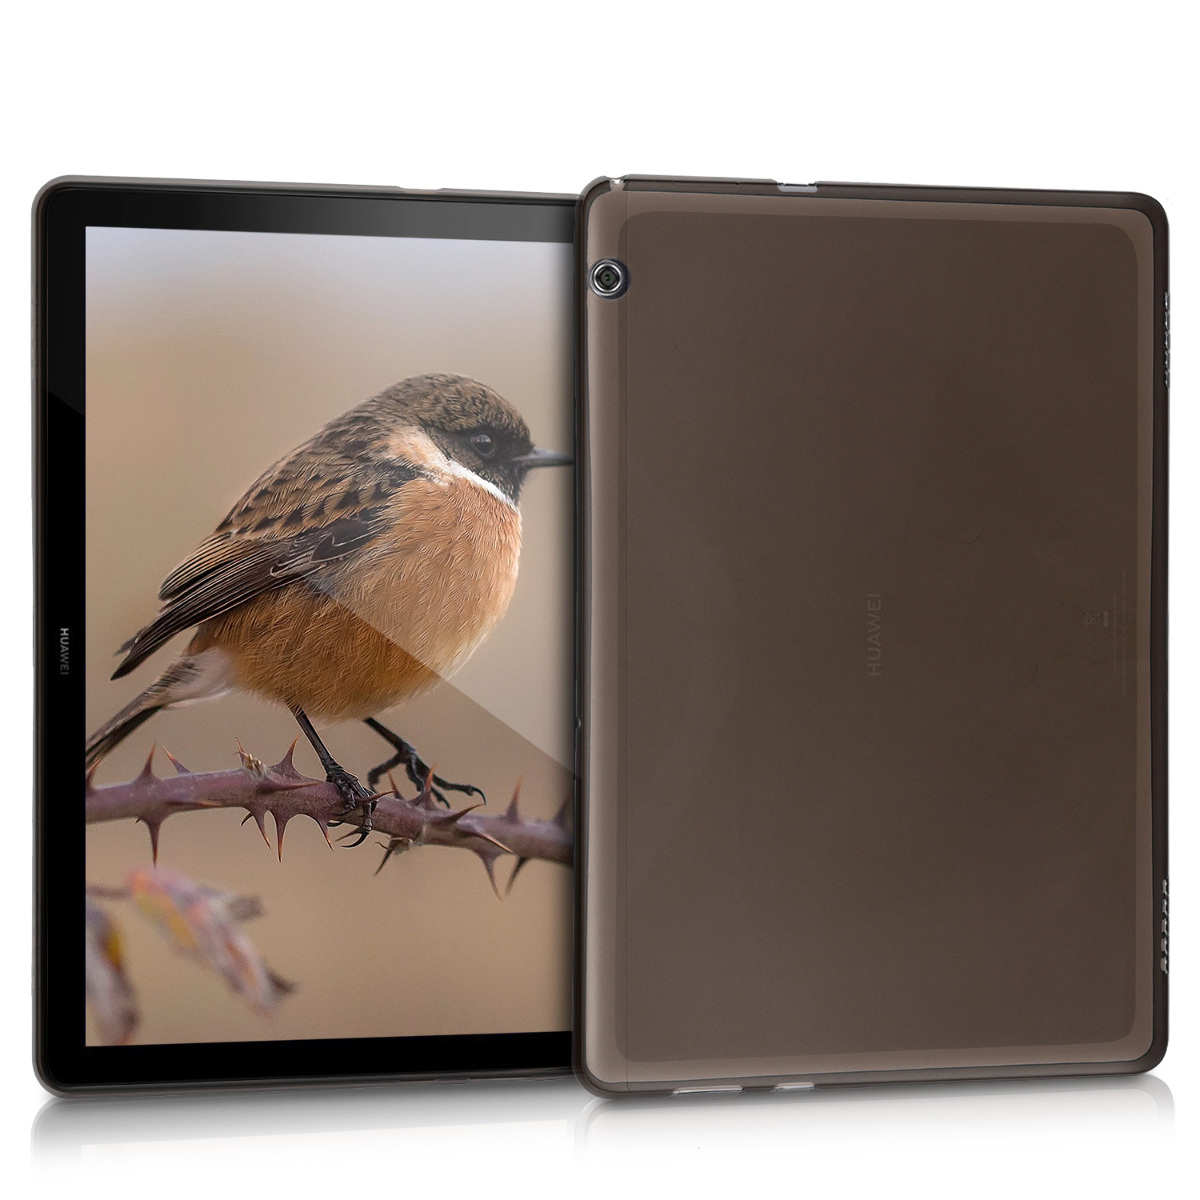 KW Θήκη Σιλικόνης Huawei MediaPad T5 10' - Black (46113.01)